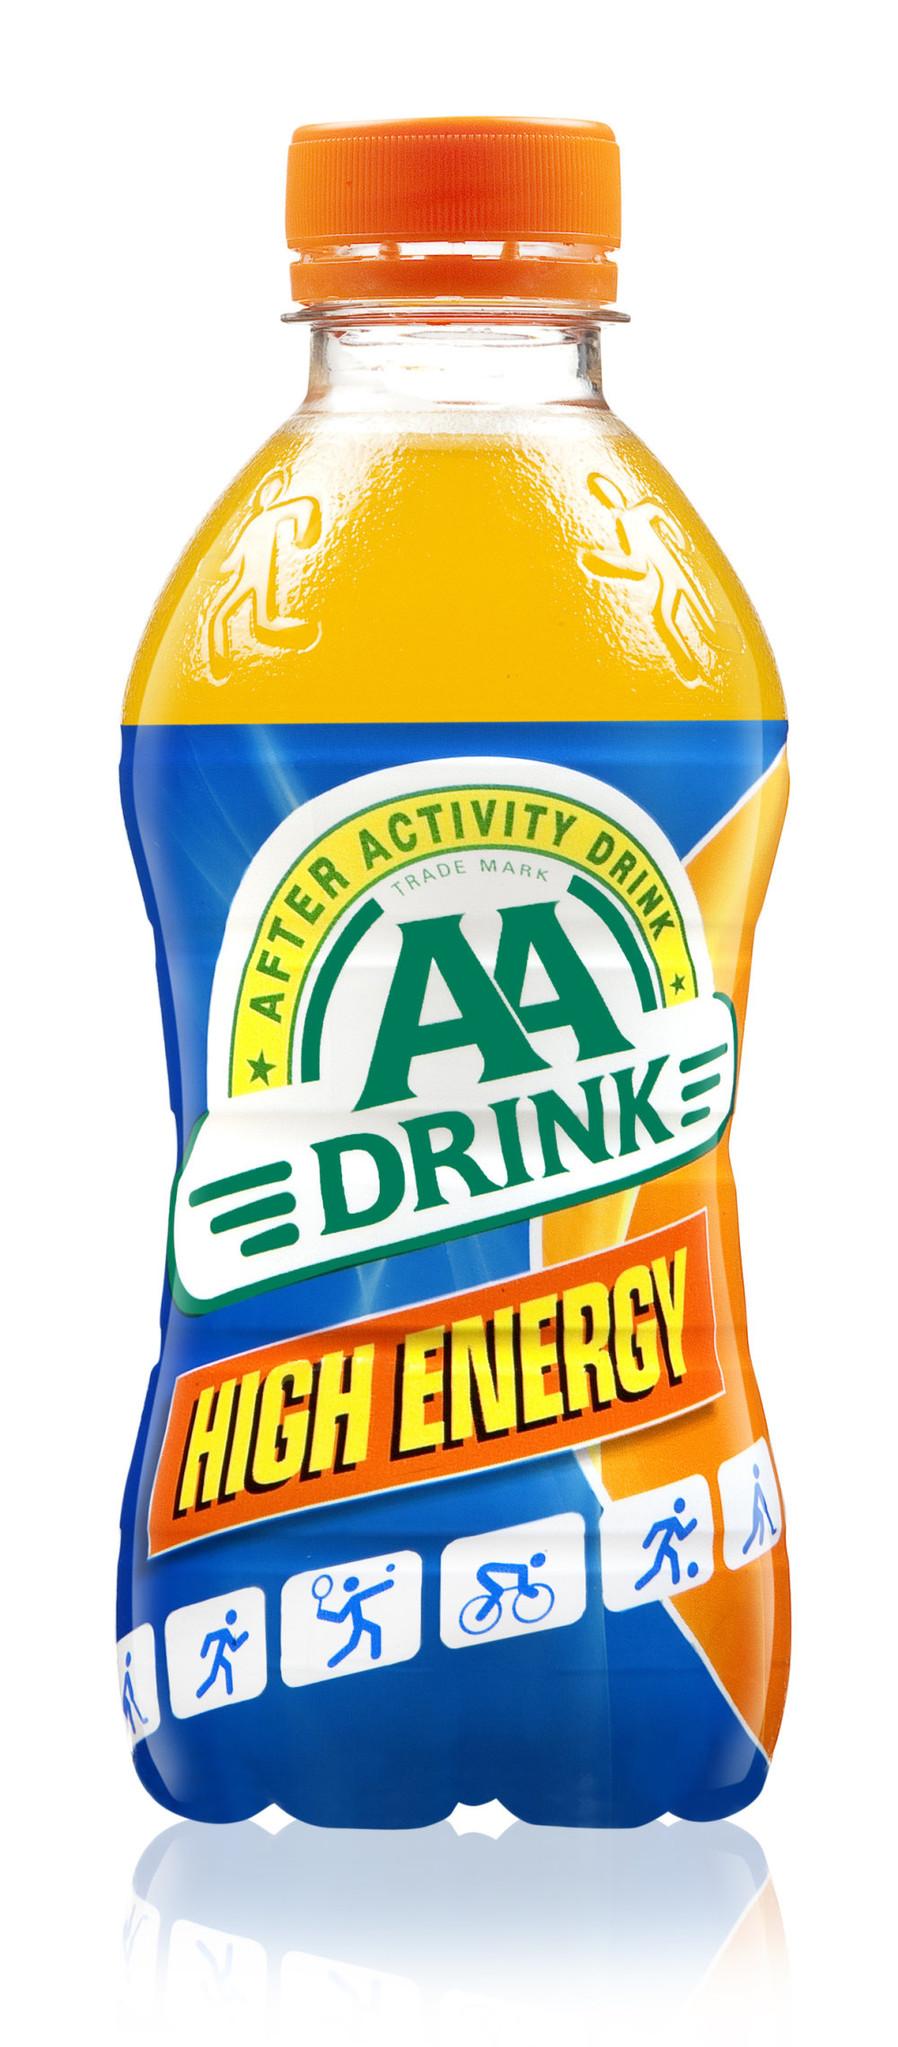 AA Drink Aa Drink - Aa Drink High Energy 33Cl Pet, 24 Flessen